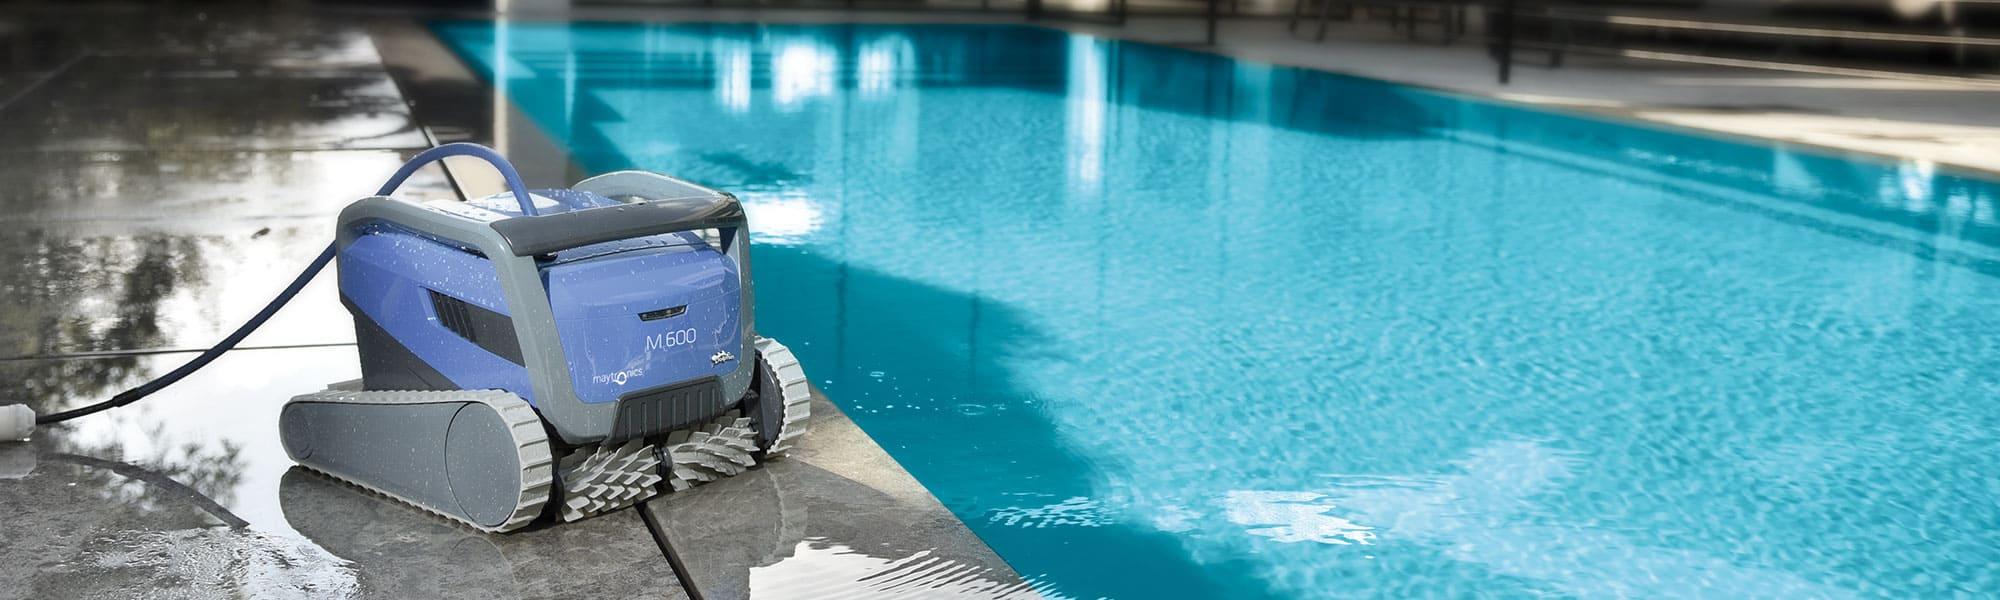 Robot Piscine Plan De Campagne robot piscine dolphin | leader des robots nettoyeurs de piscine